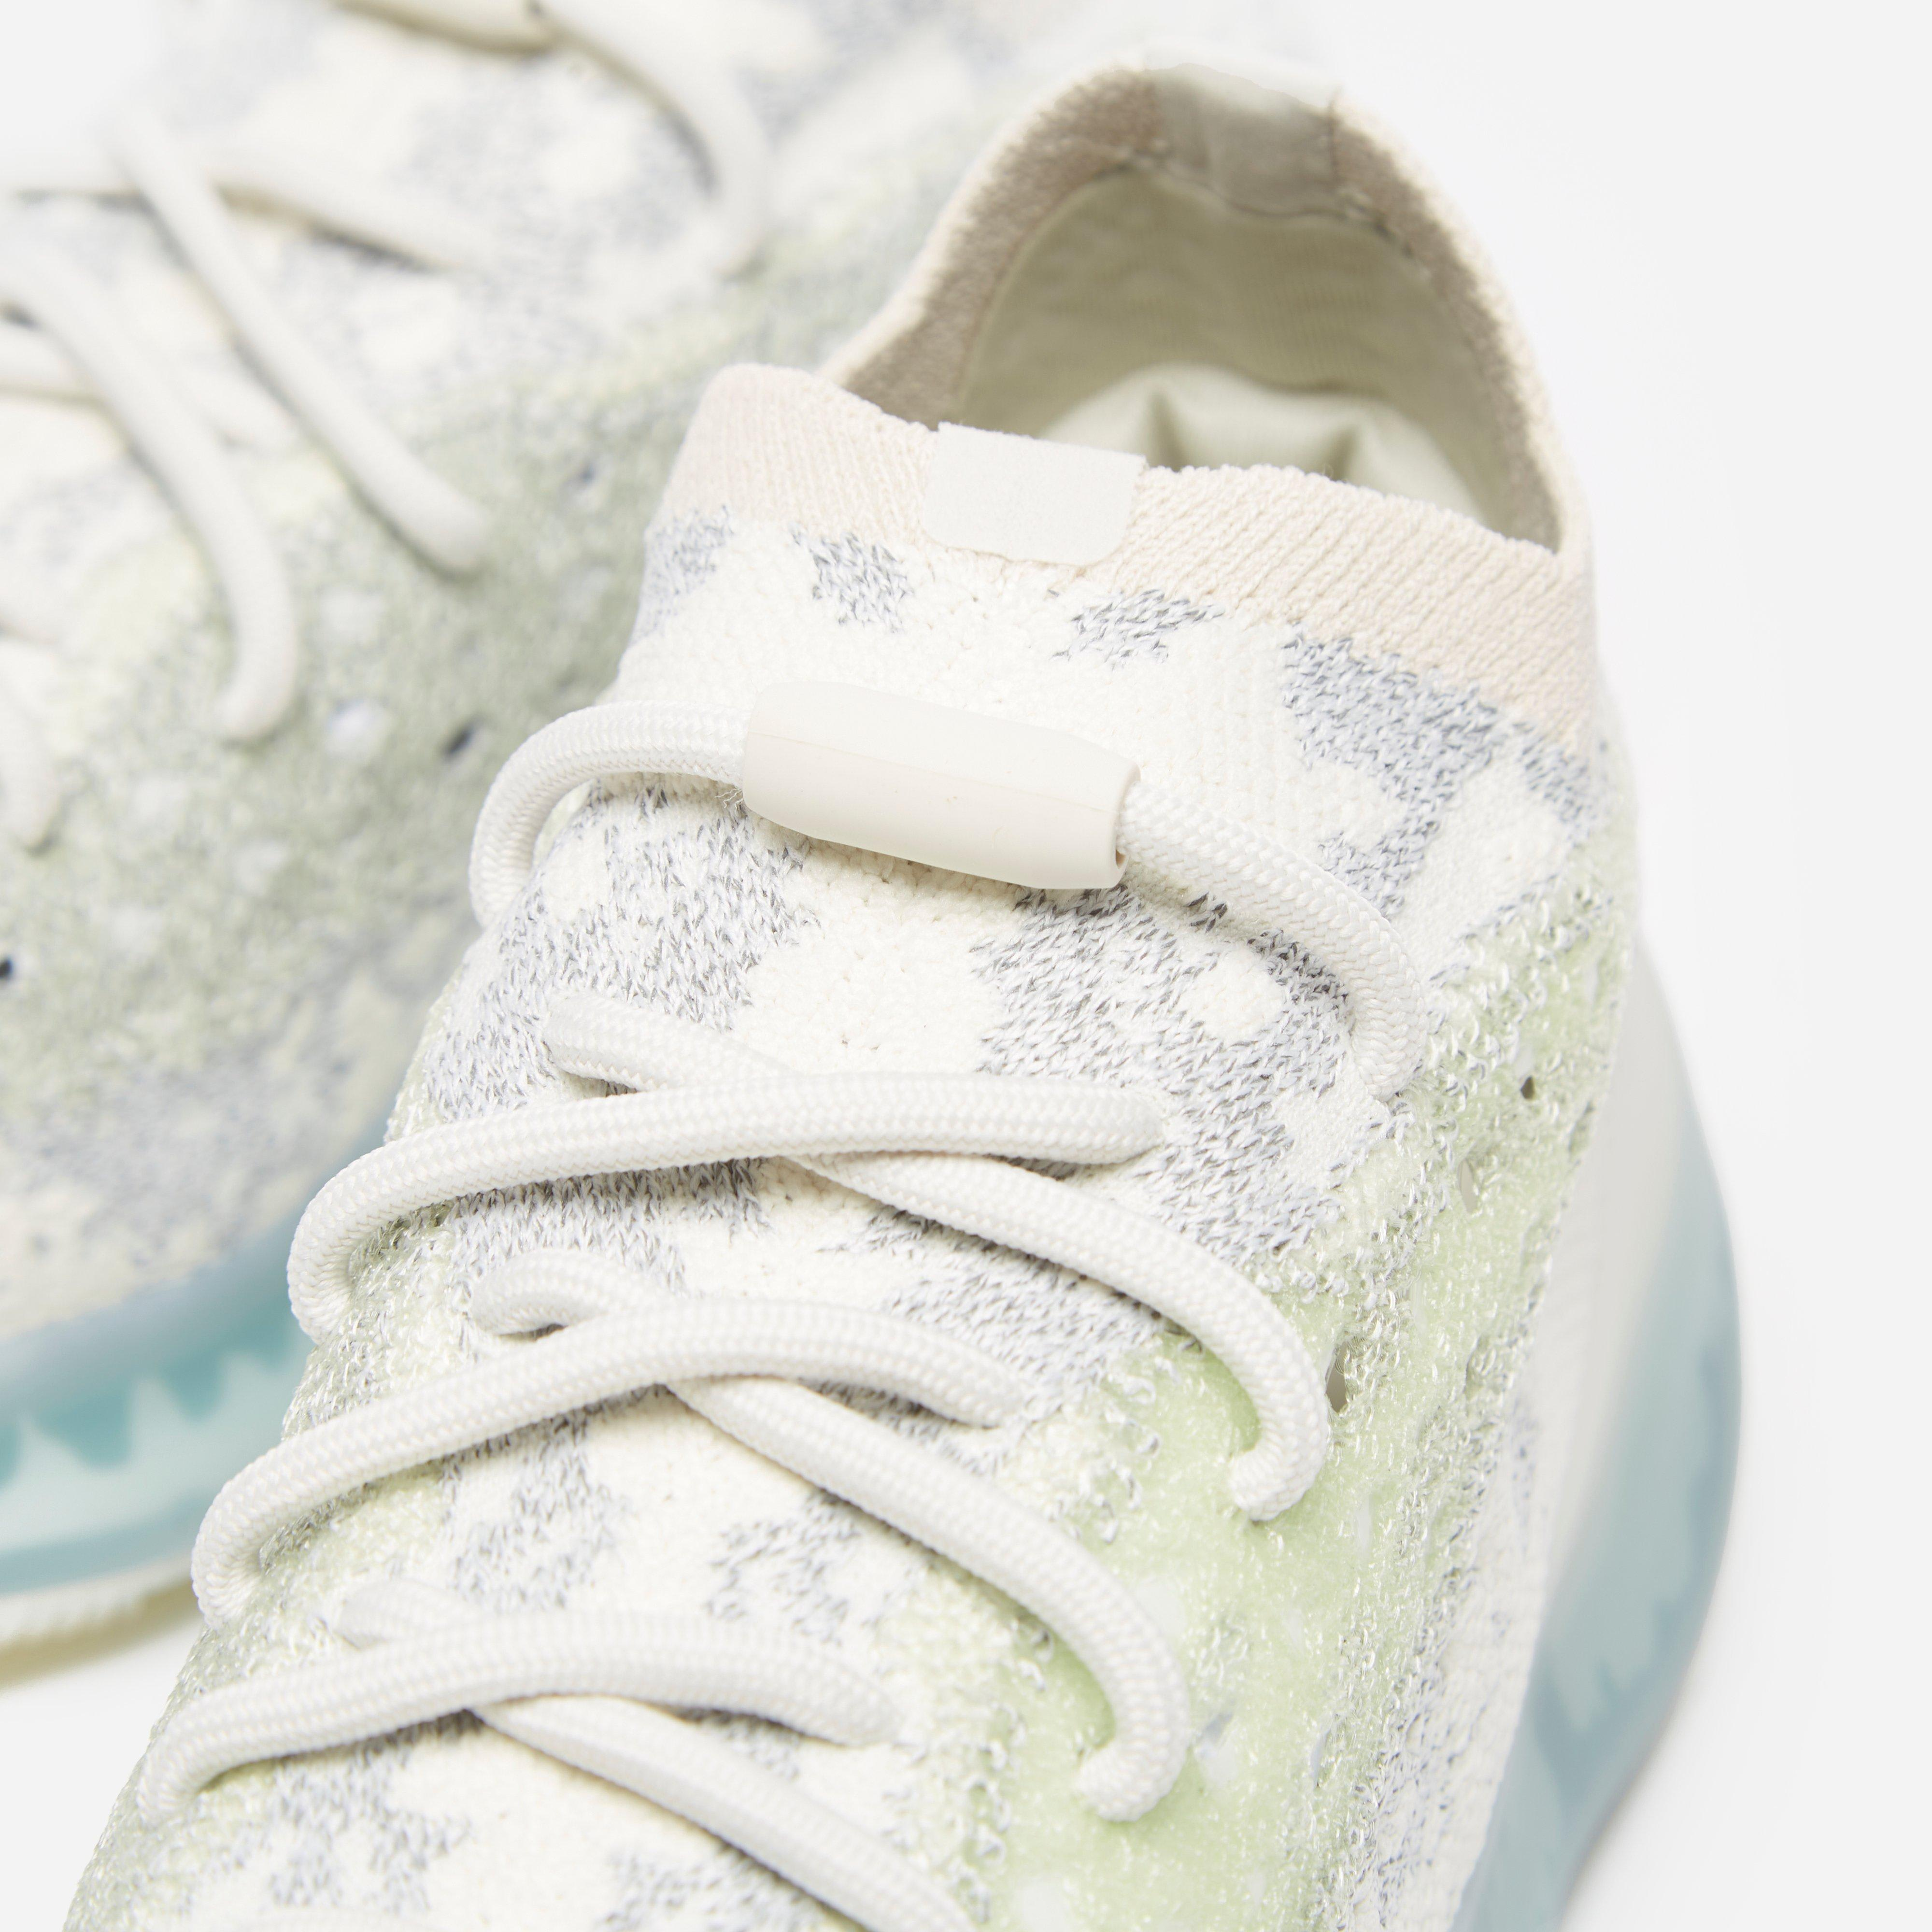 Adidas Yeezy Boost 380 'Alien Blue' GW0304 Tongue